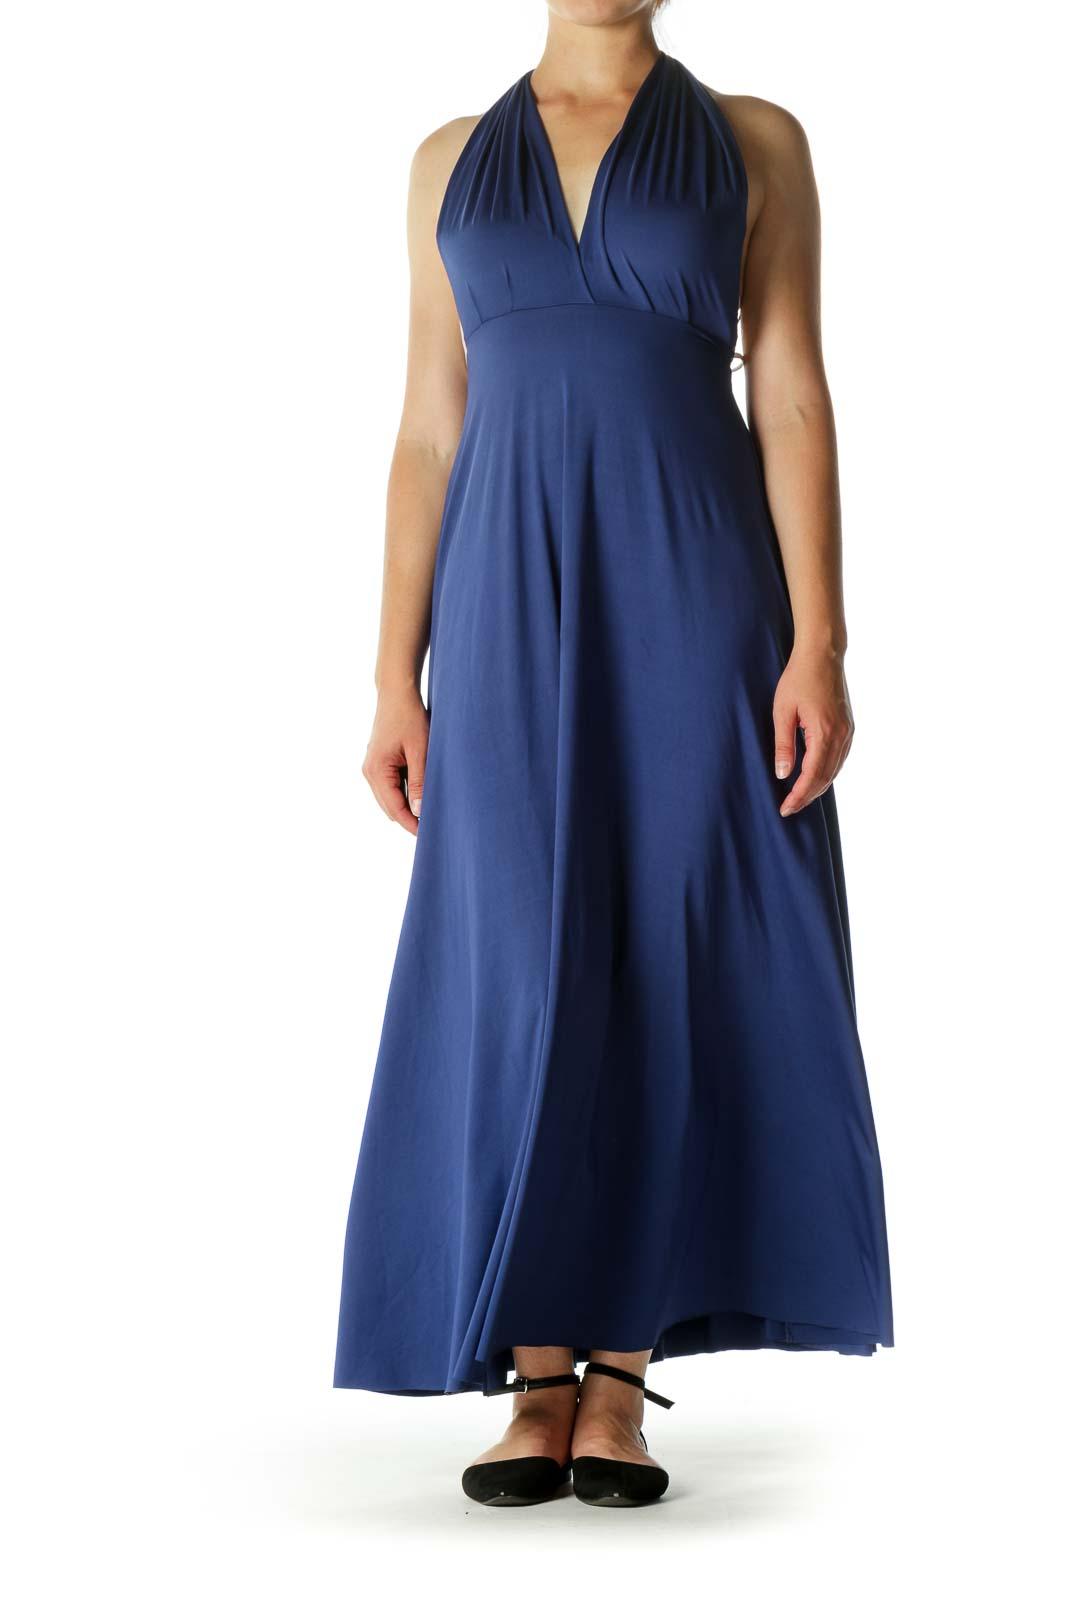 Blue Empire Cut Stretch Evening Dress Front